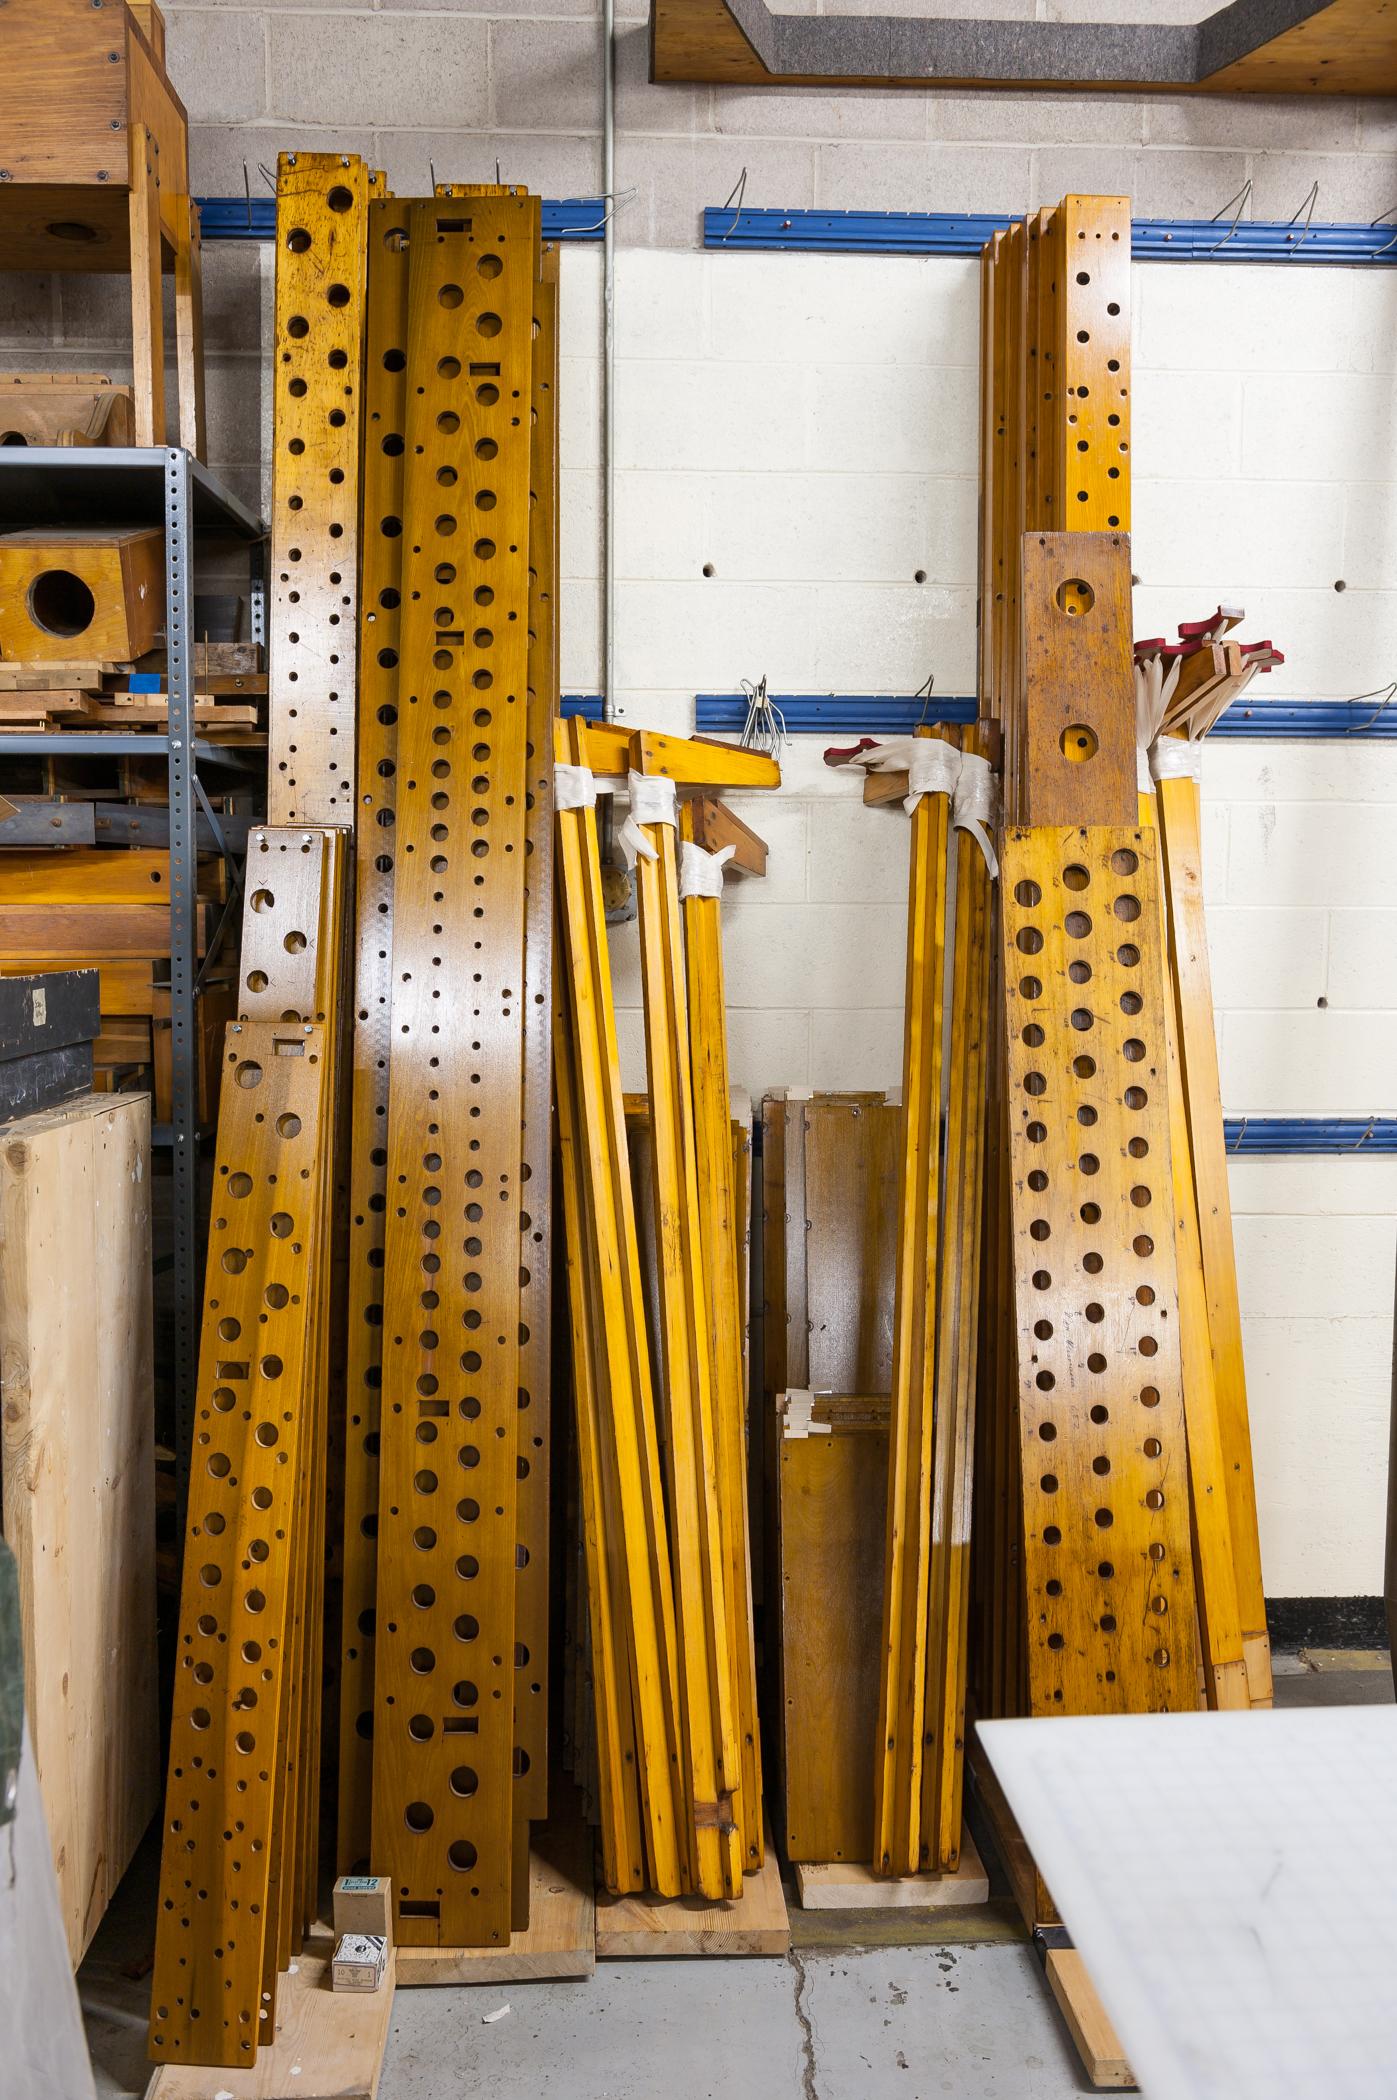 Refinished wood components ©2014 David Ottenstein